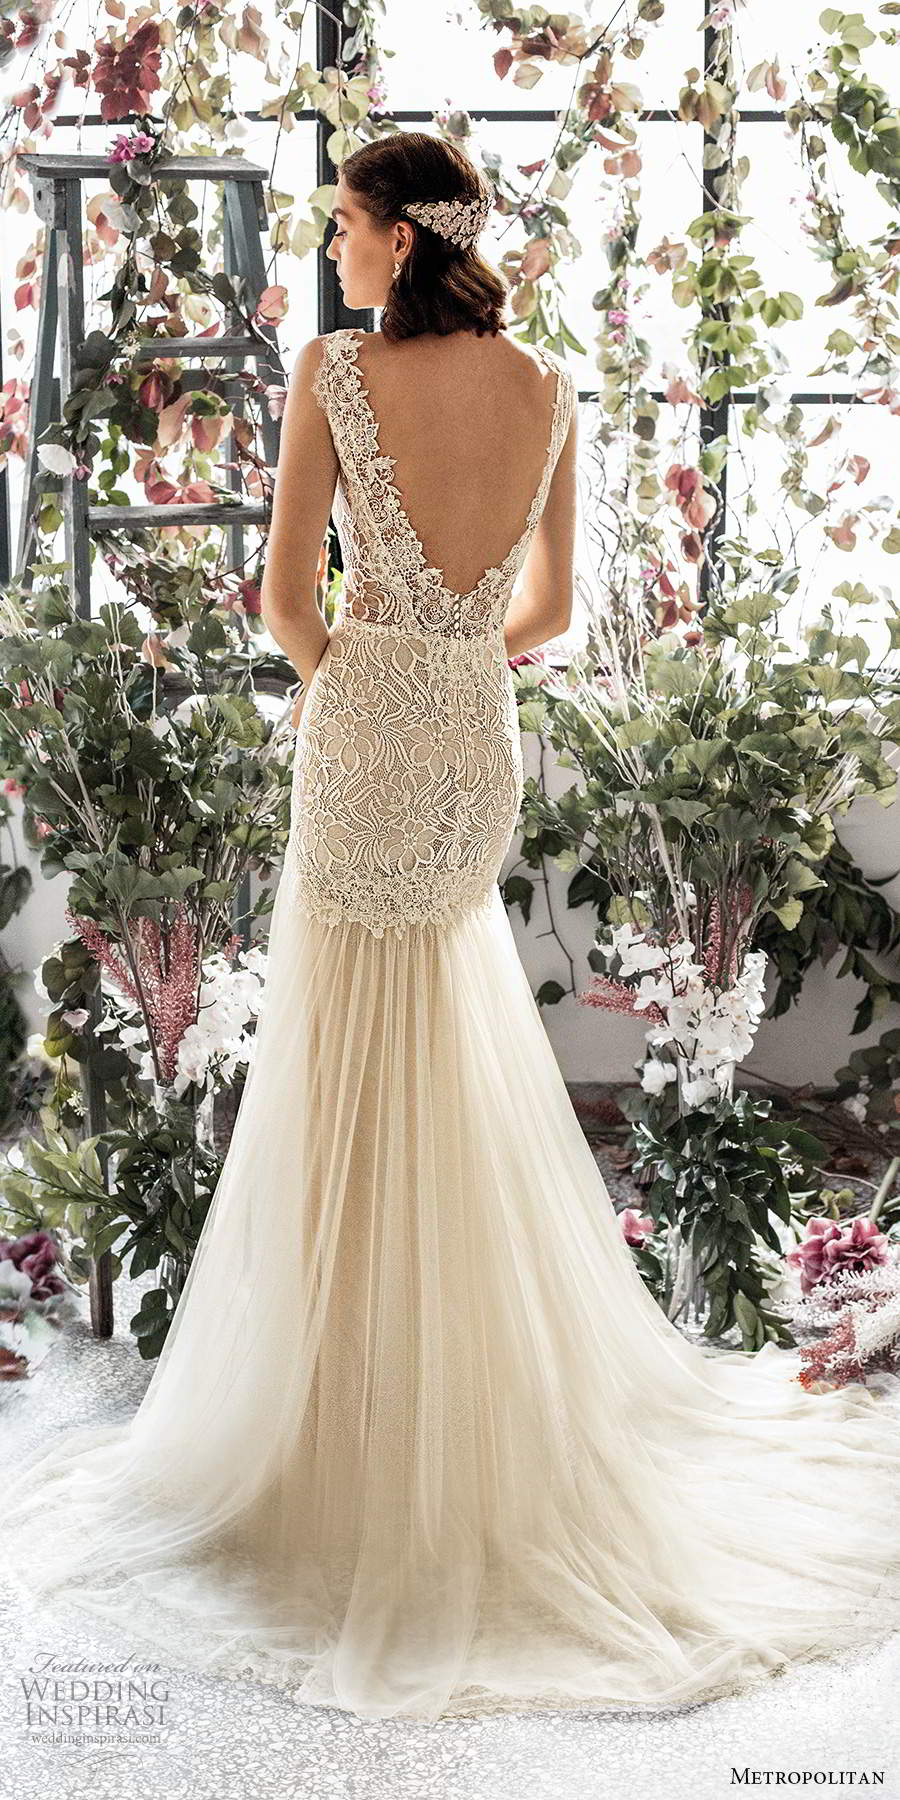 metropolitan spring 2020 bridal sleeveless thick straps plunging v neckline embellished lace bodice fit flare mermaid wedding dress scoop back chapel train (7) bv